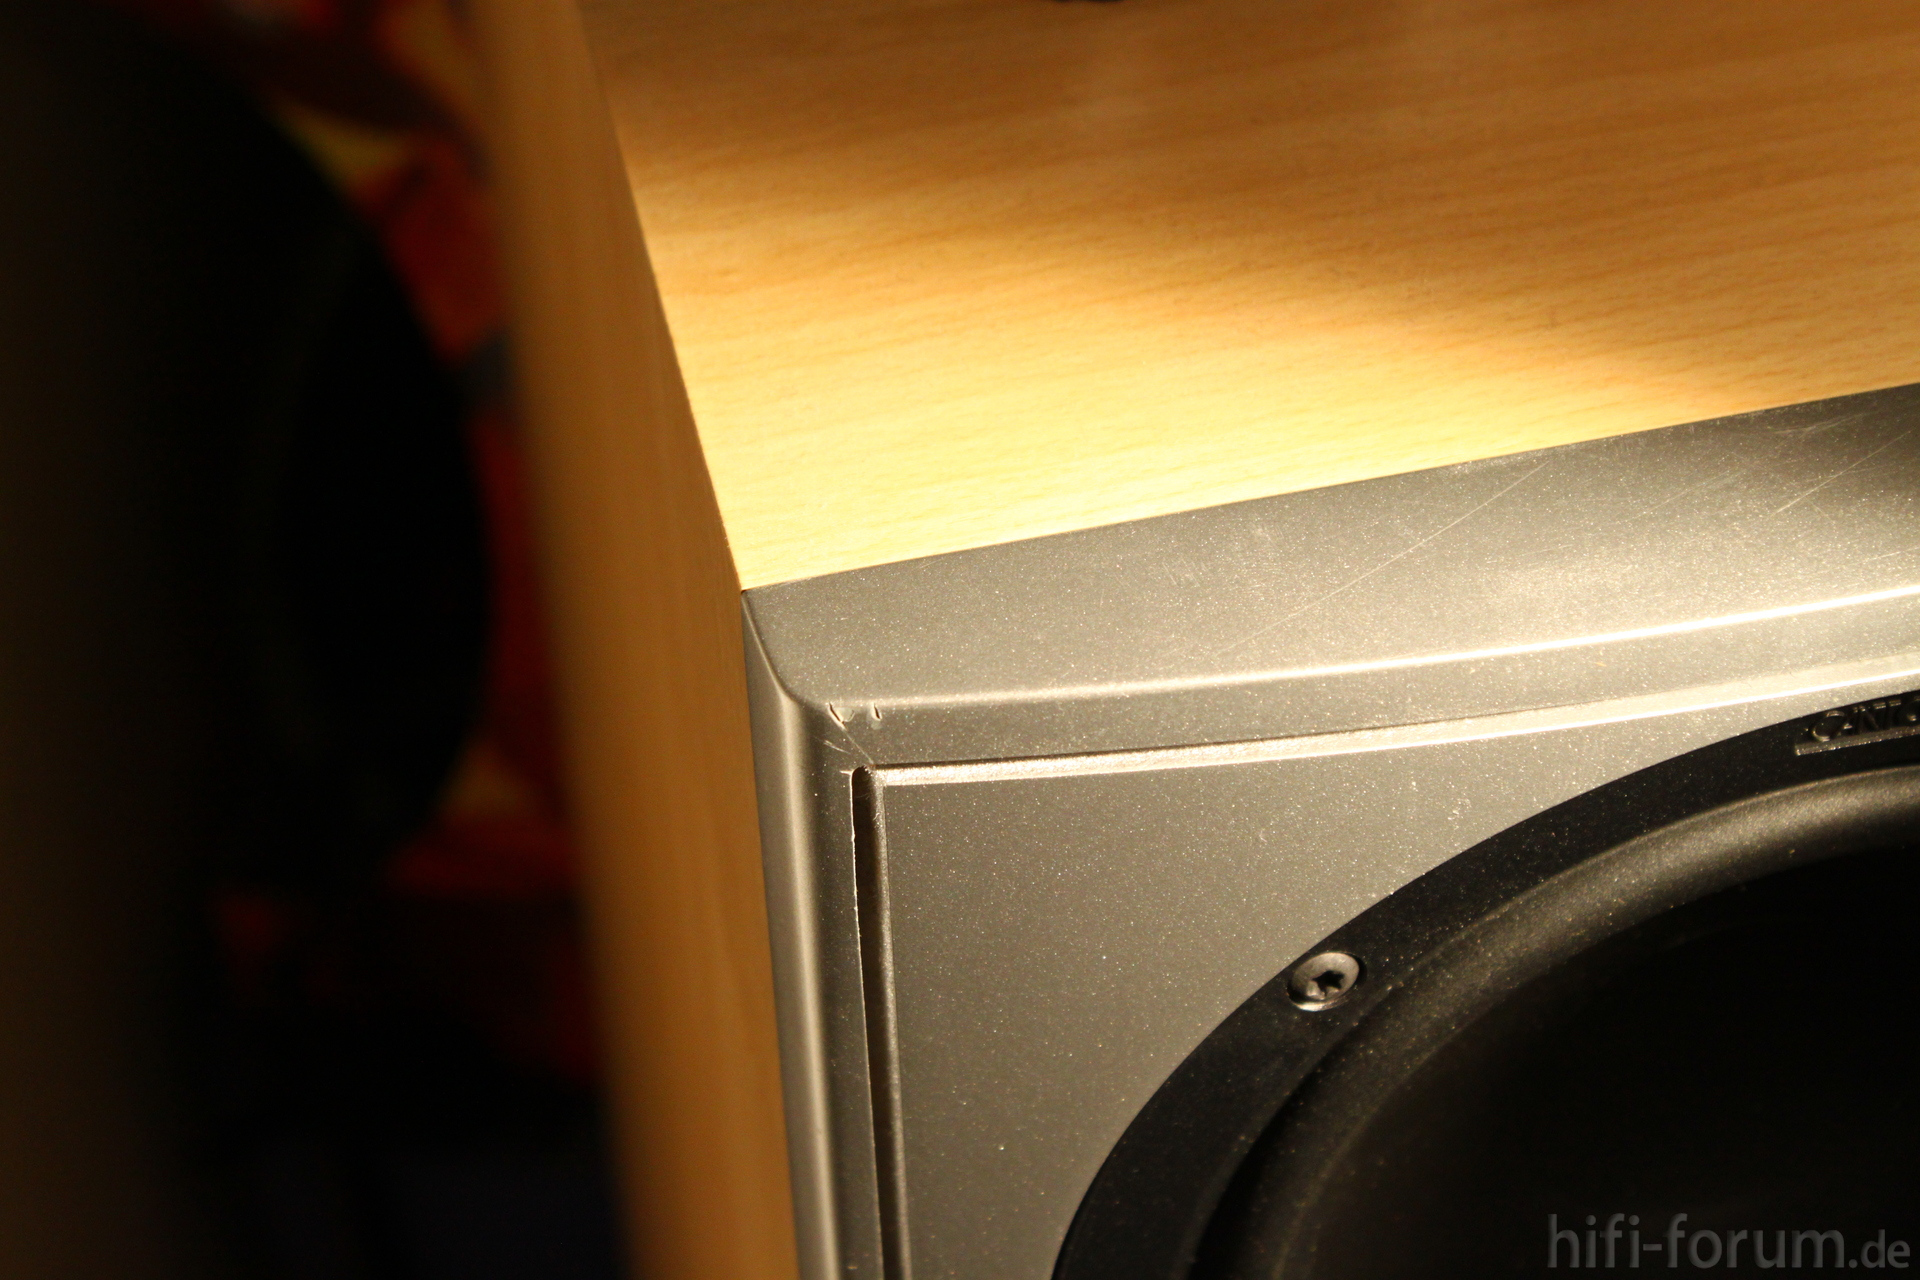 img 4836 doityourself lautsprecher hifi bildergalerie. Black Bedroom Furniture Sets. Home Design Ideas